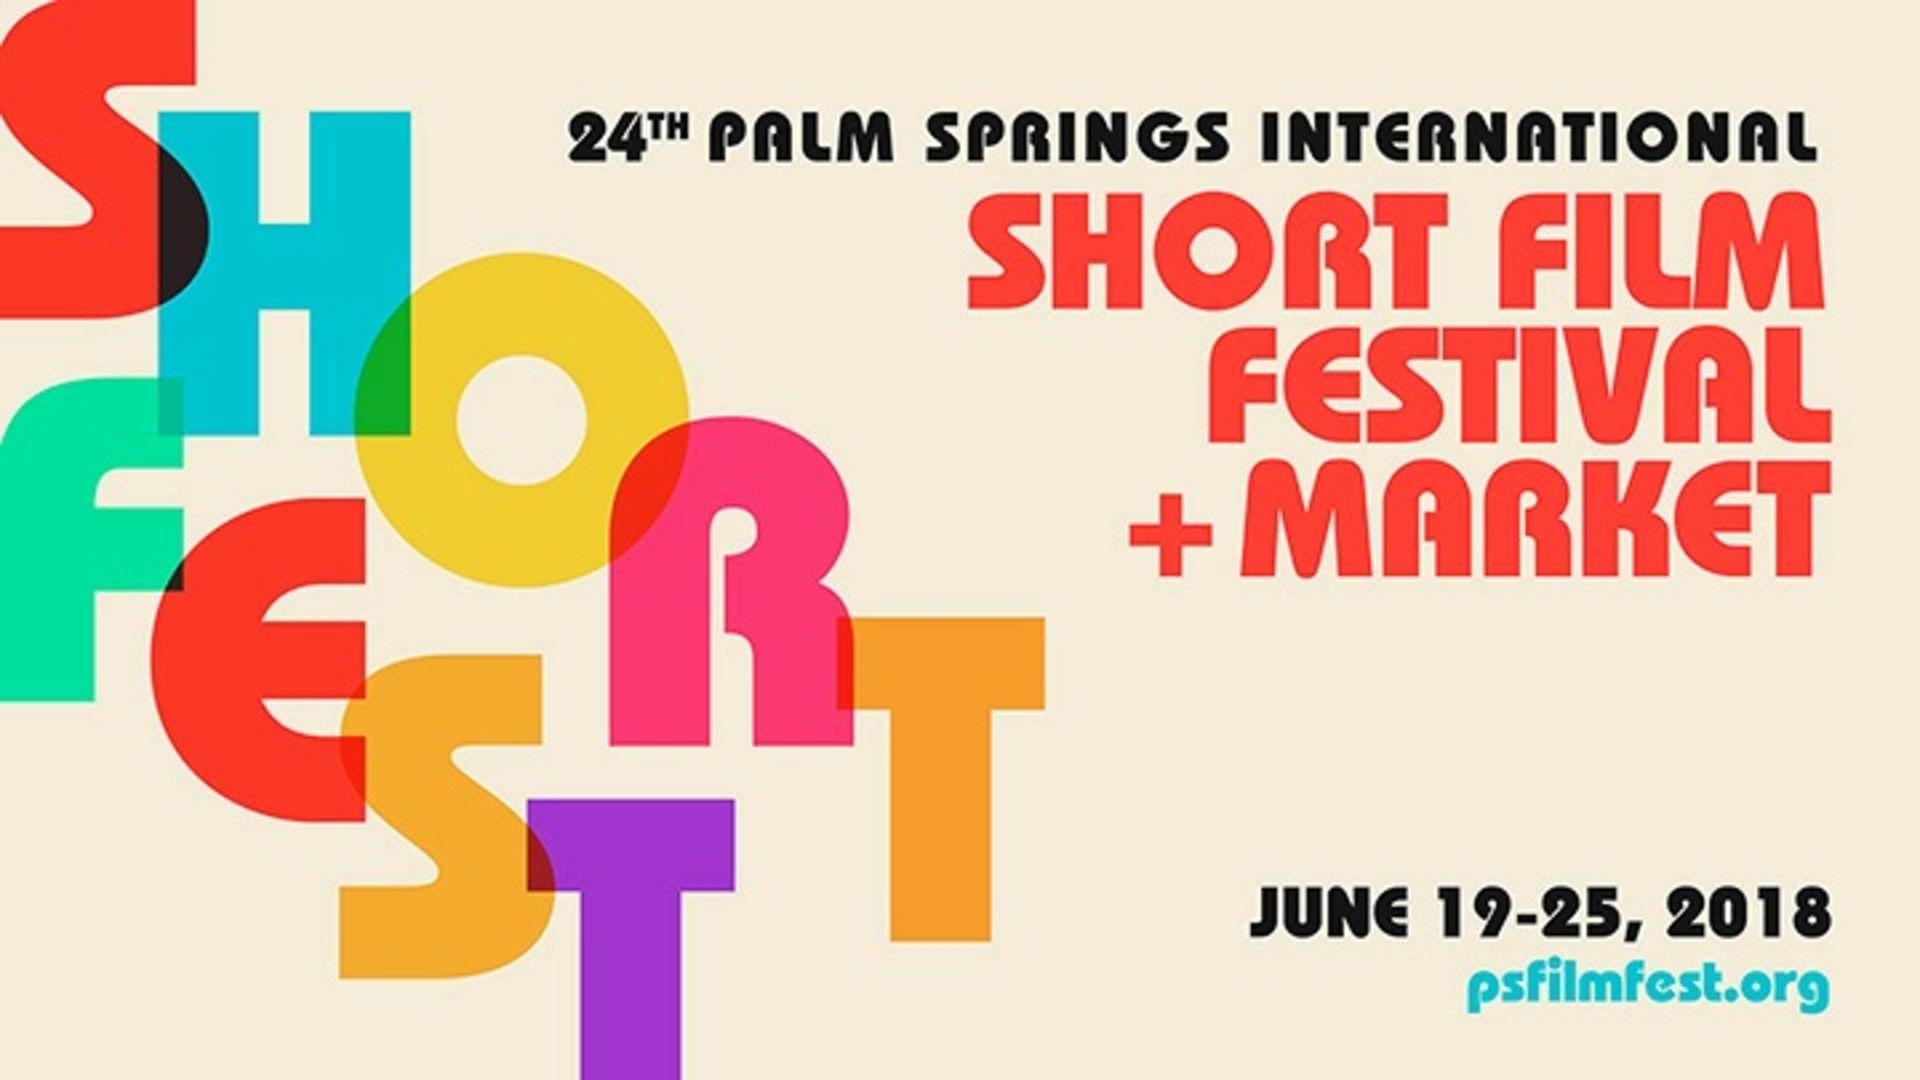 24TH PALM SPRINGS INTERNATIONAL SHORTFEST – ON-SALE JUNE 13